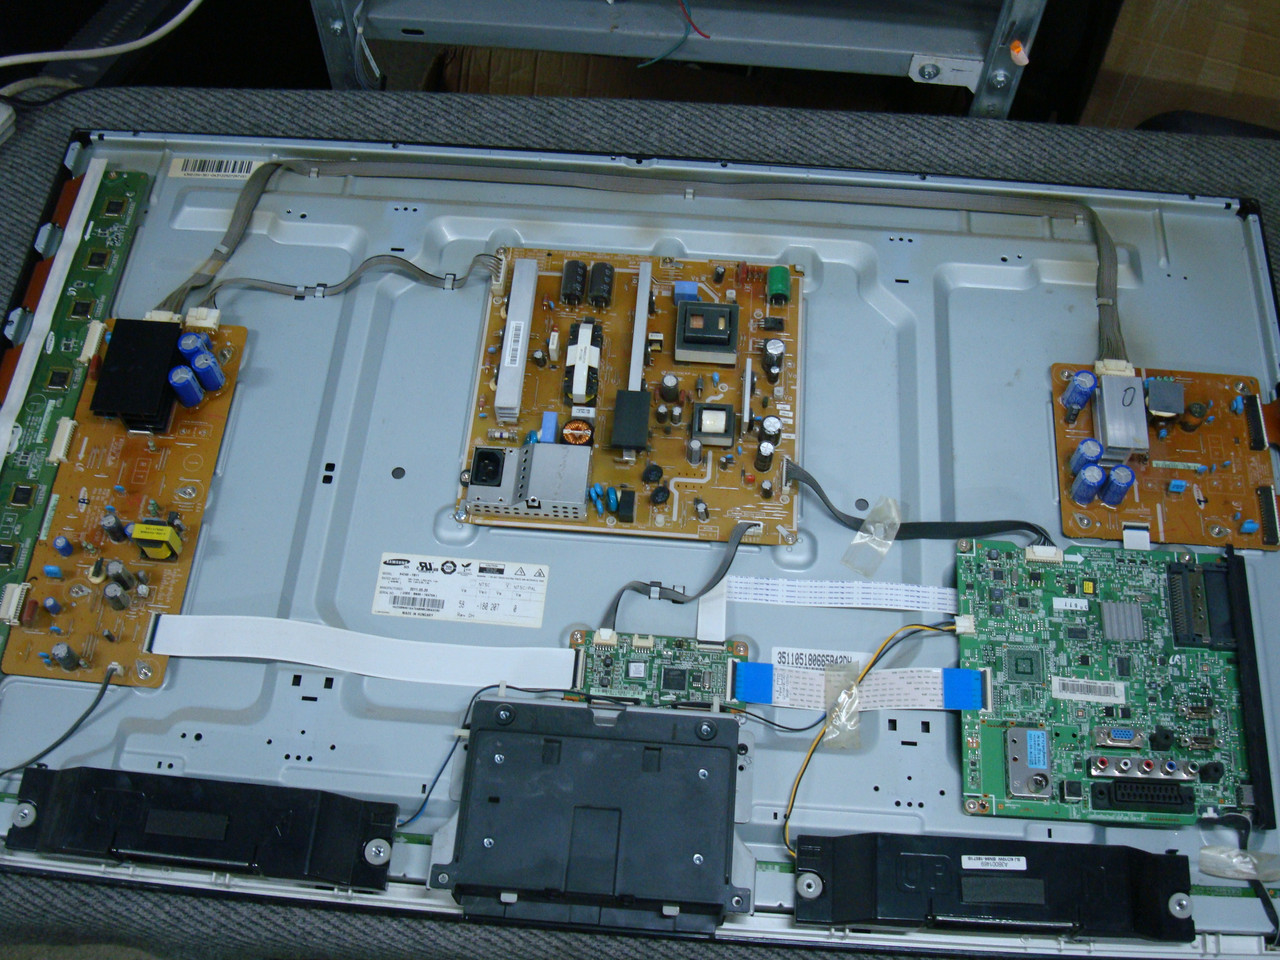 Запчасти к телевизору Samsung PS43D451A3W (BN41-01632C, BN44-00442B, LJ41-09475A, LJ41-09478A)